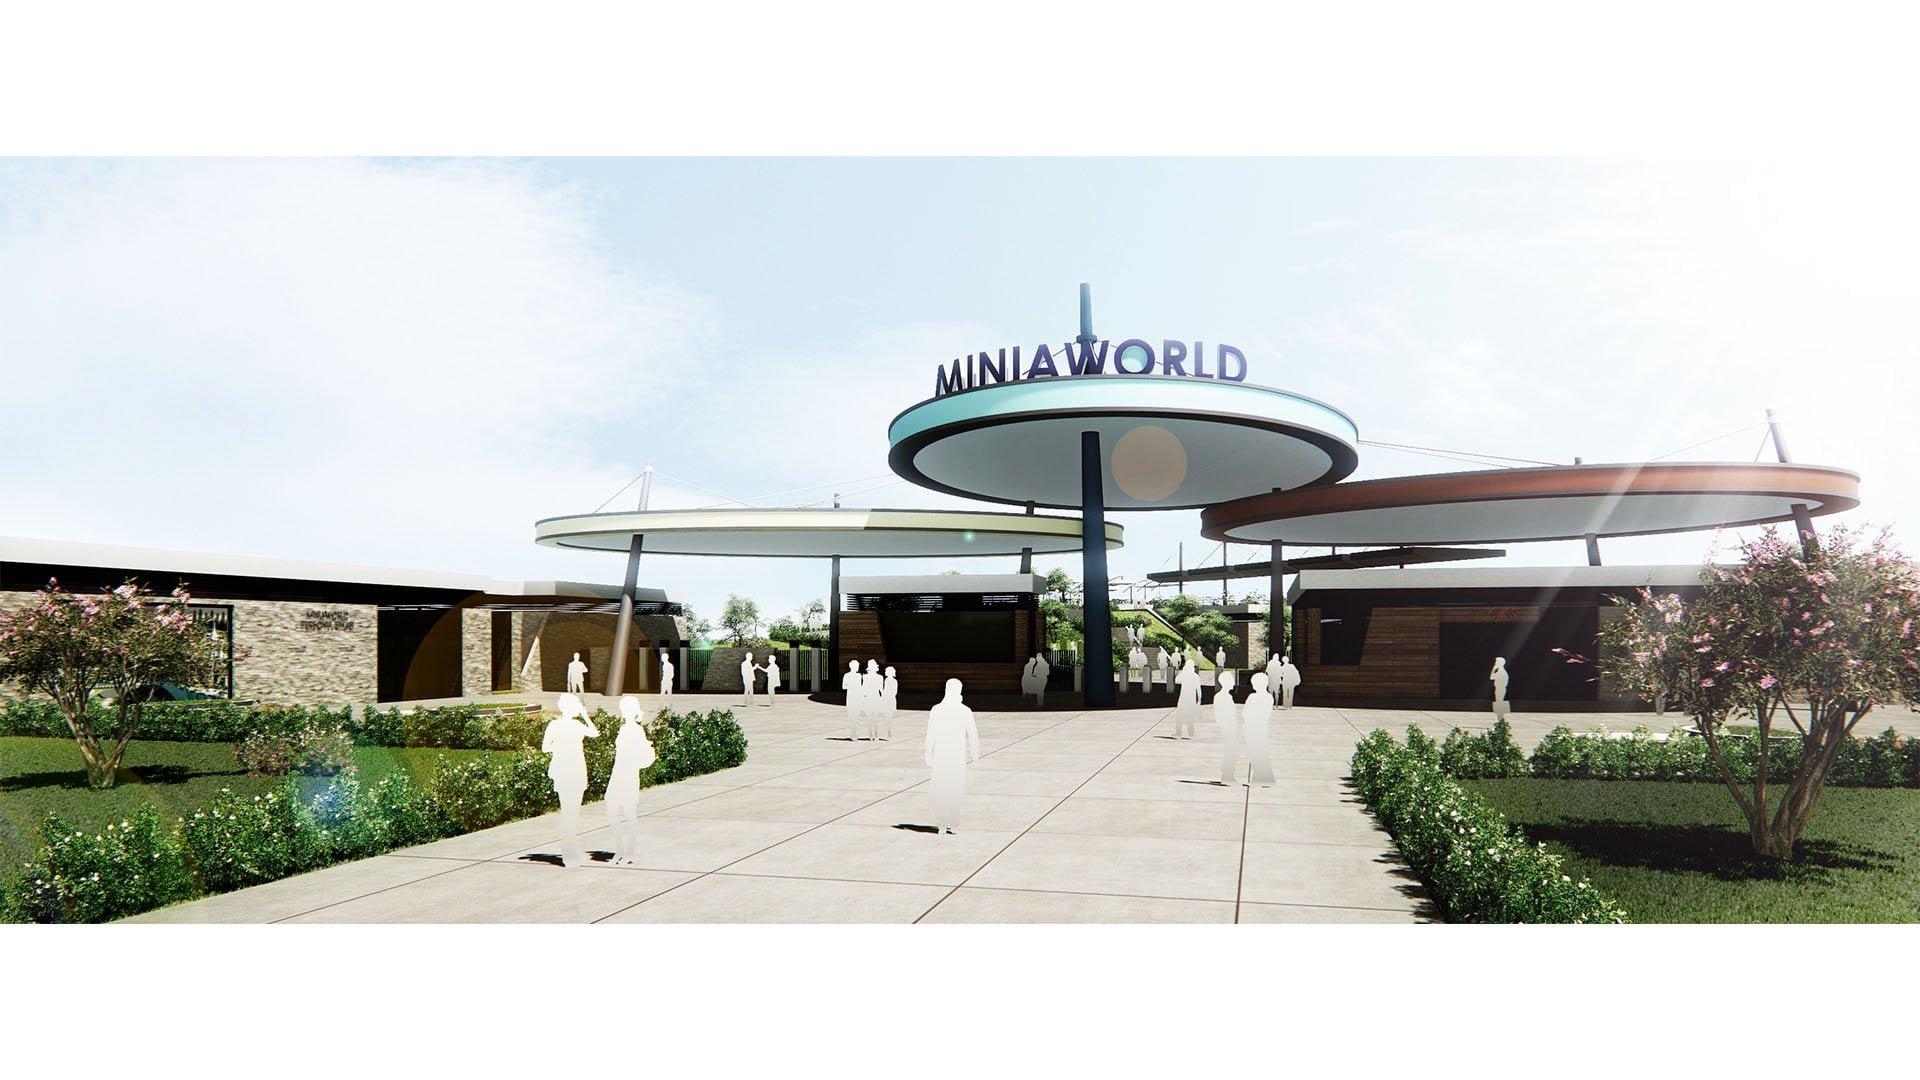 Miniaworld